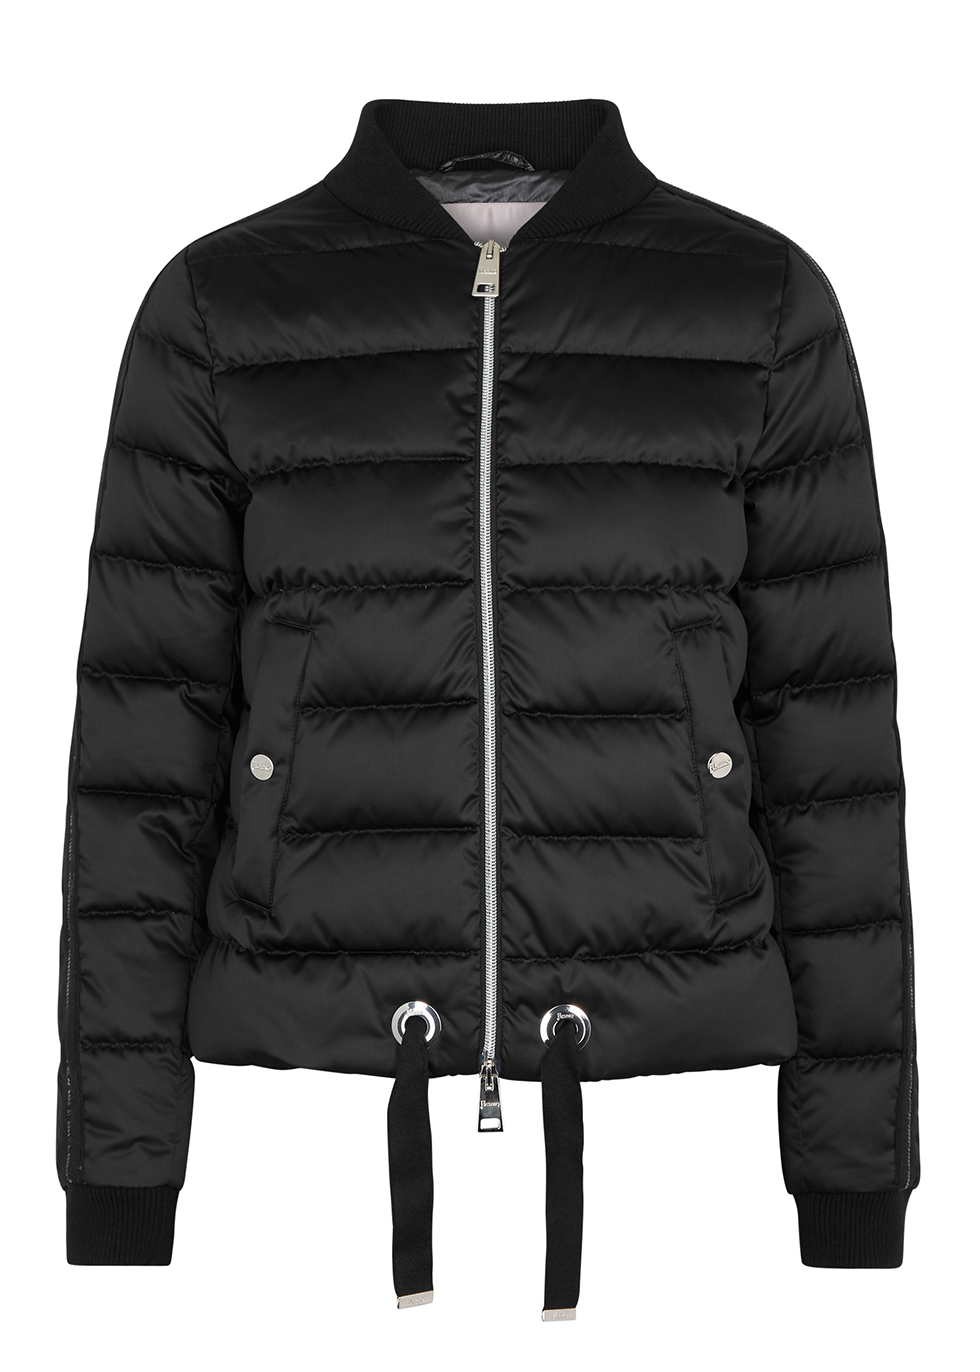 Black quilted satin jacket